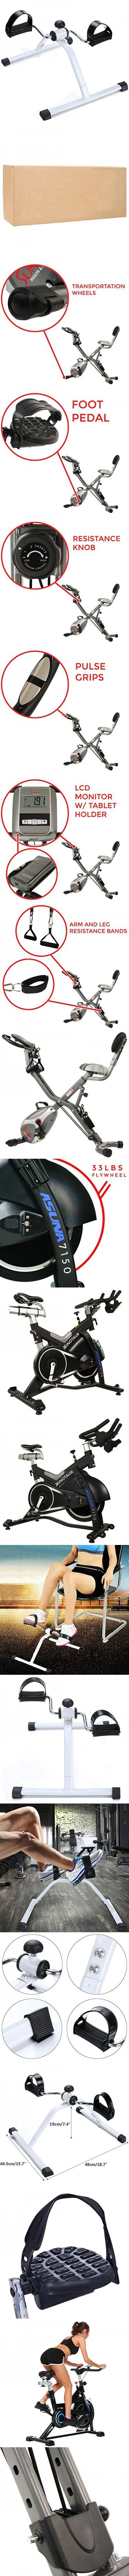 FDegage Folding Adjustable Exercise Bikes Mini Fitness Pedal Exerciser with Resistance Knob 1